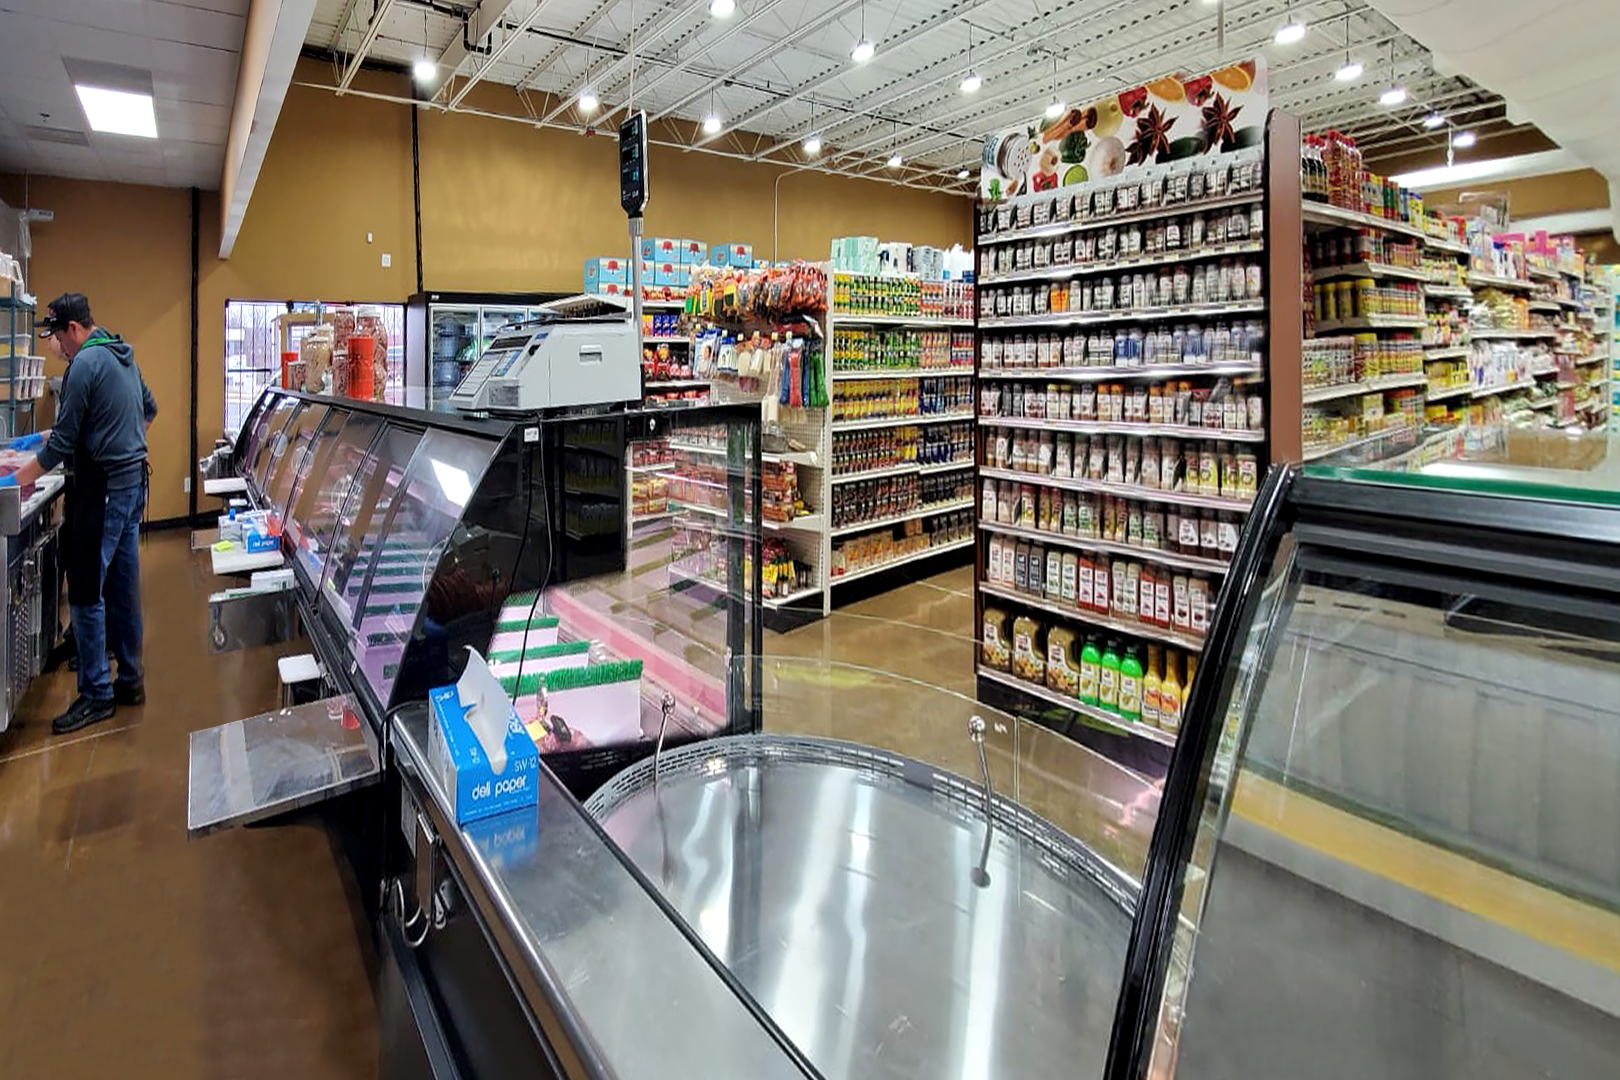 Специализированные витрины для продажи мяса Missouri MC 120 meat PS 130-SLM, промо-витрина Missouri MC 120 accent self 086-DBM